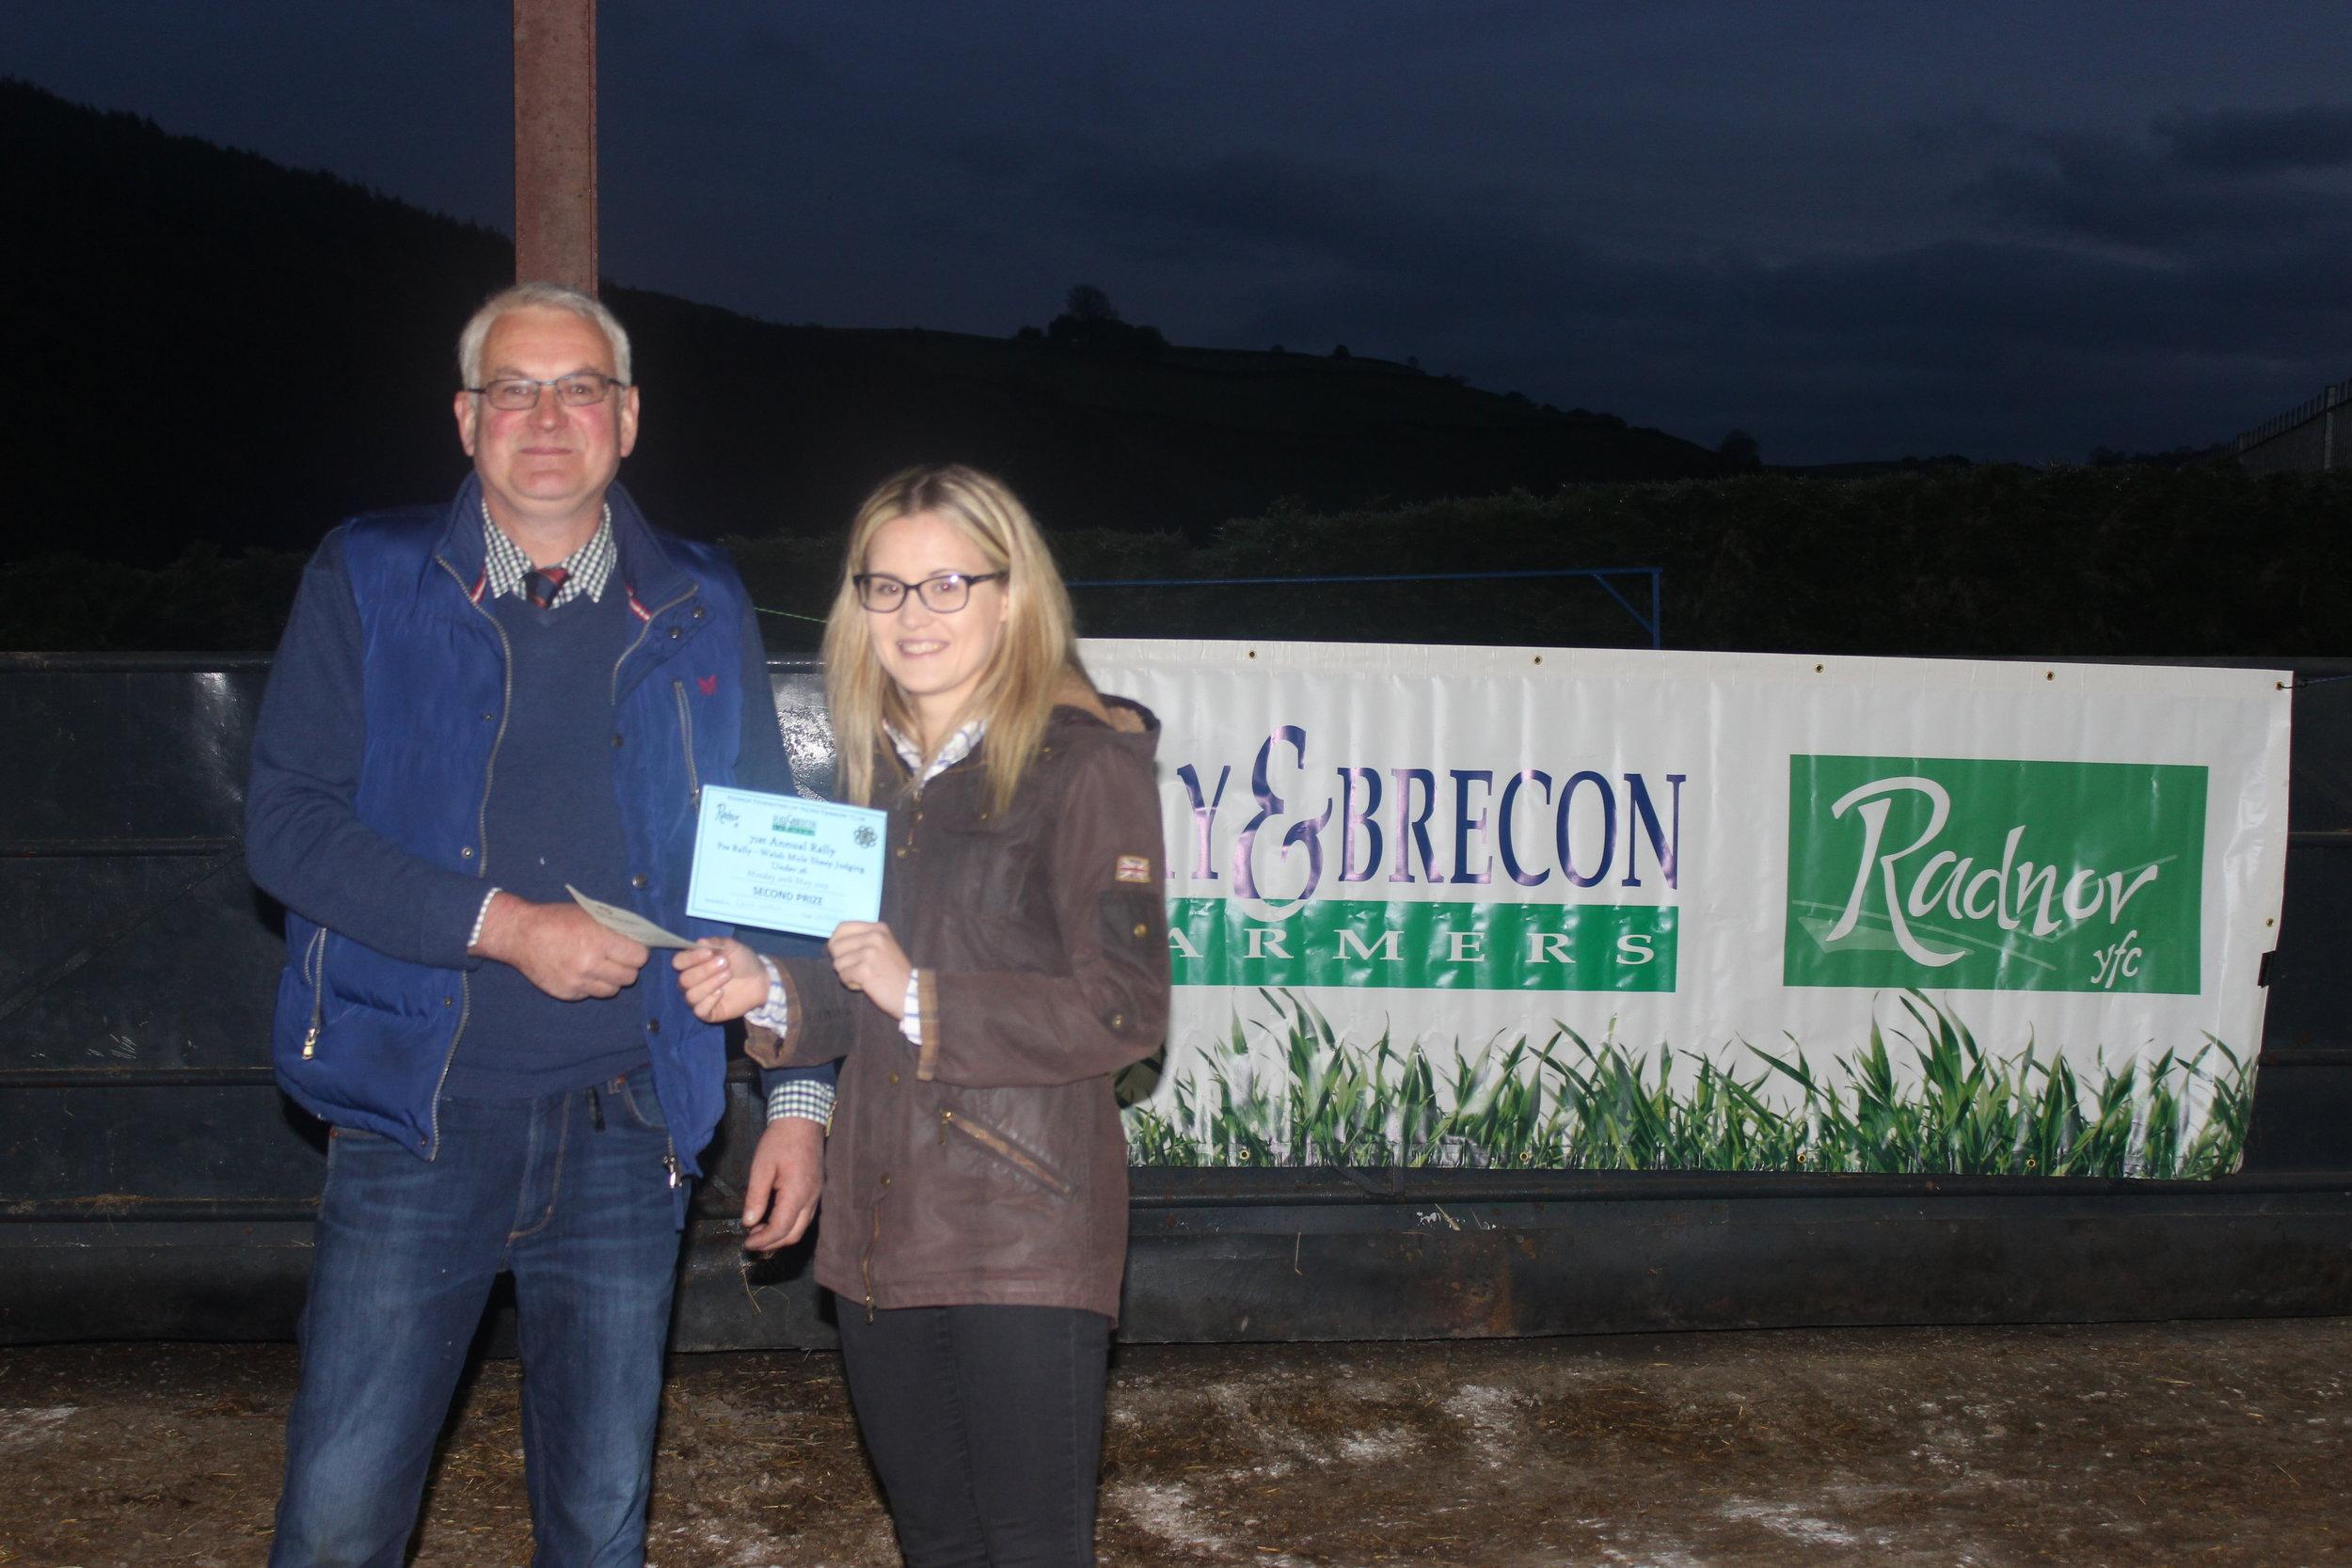 Laura Watson, Llanbadarn Fynydd YFC - 2nd place in the Welsh Mule Stockjudging with Judge Morton Powell.